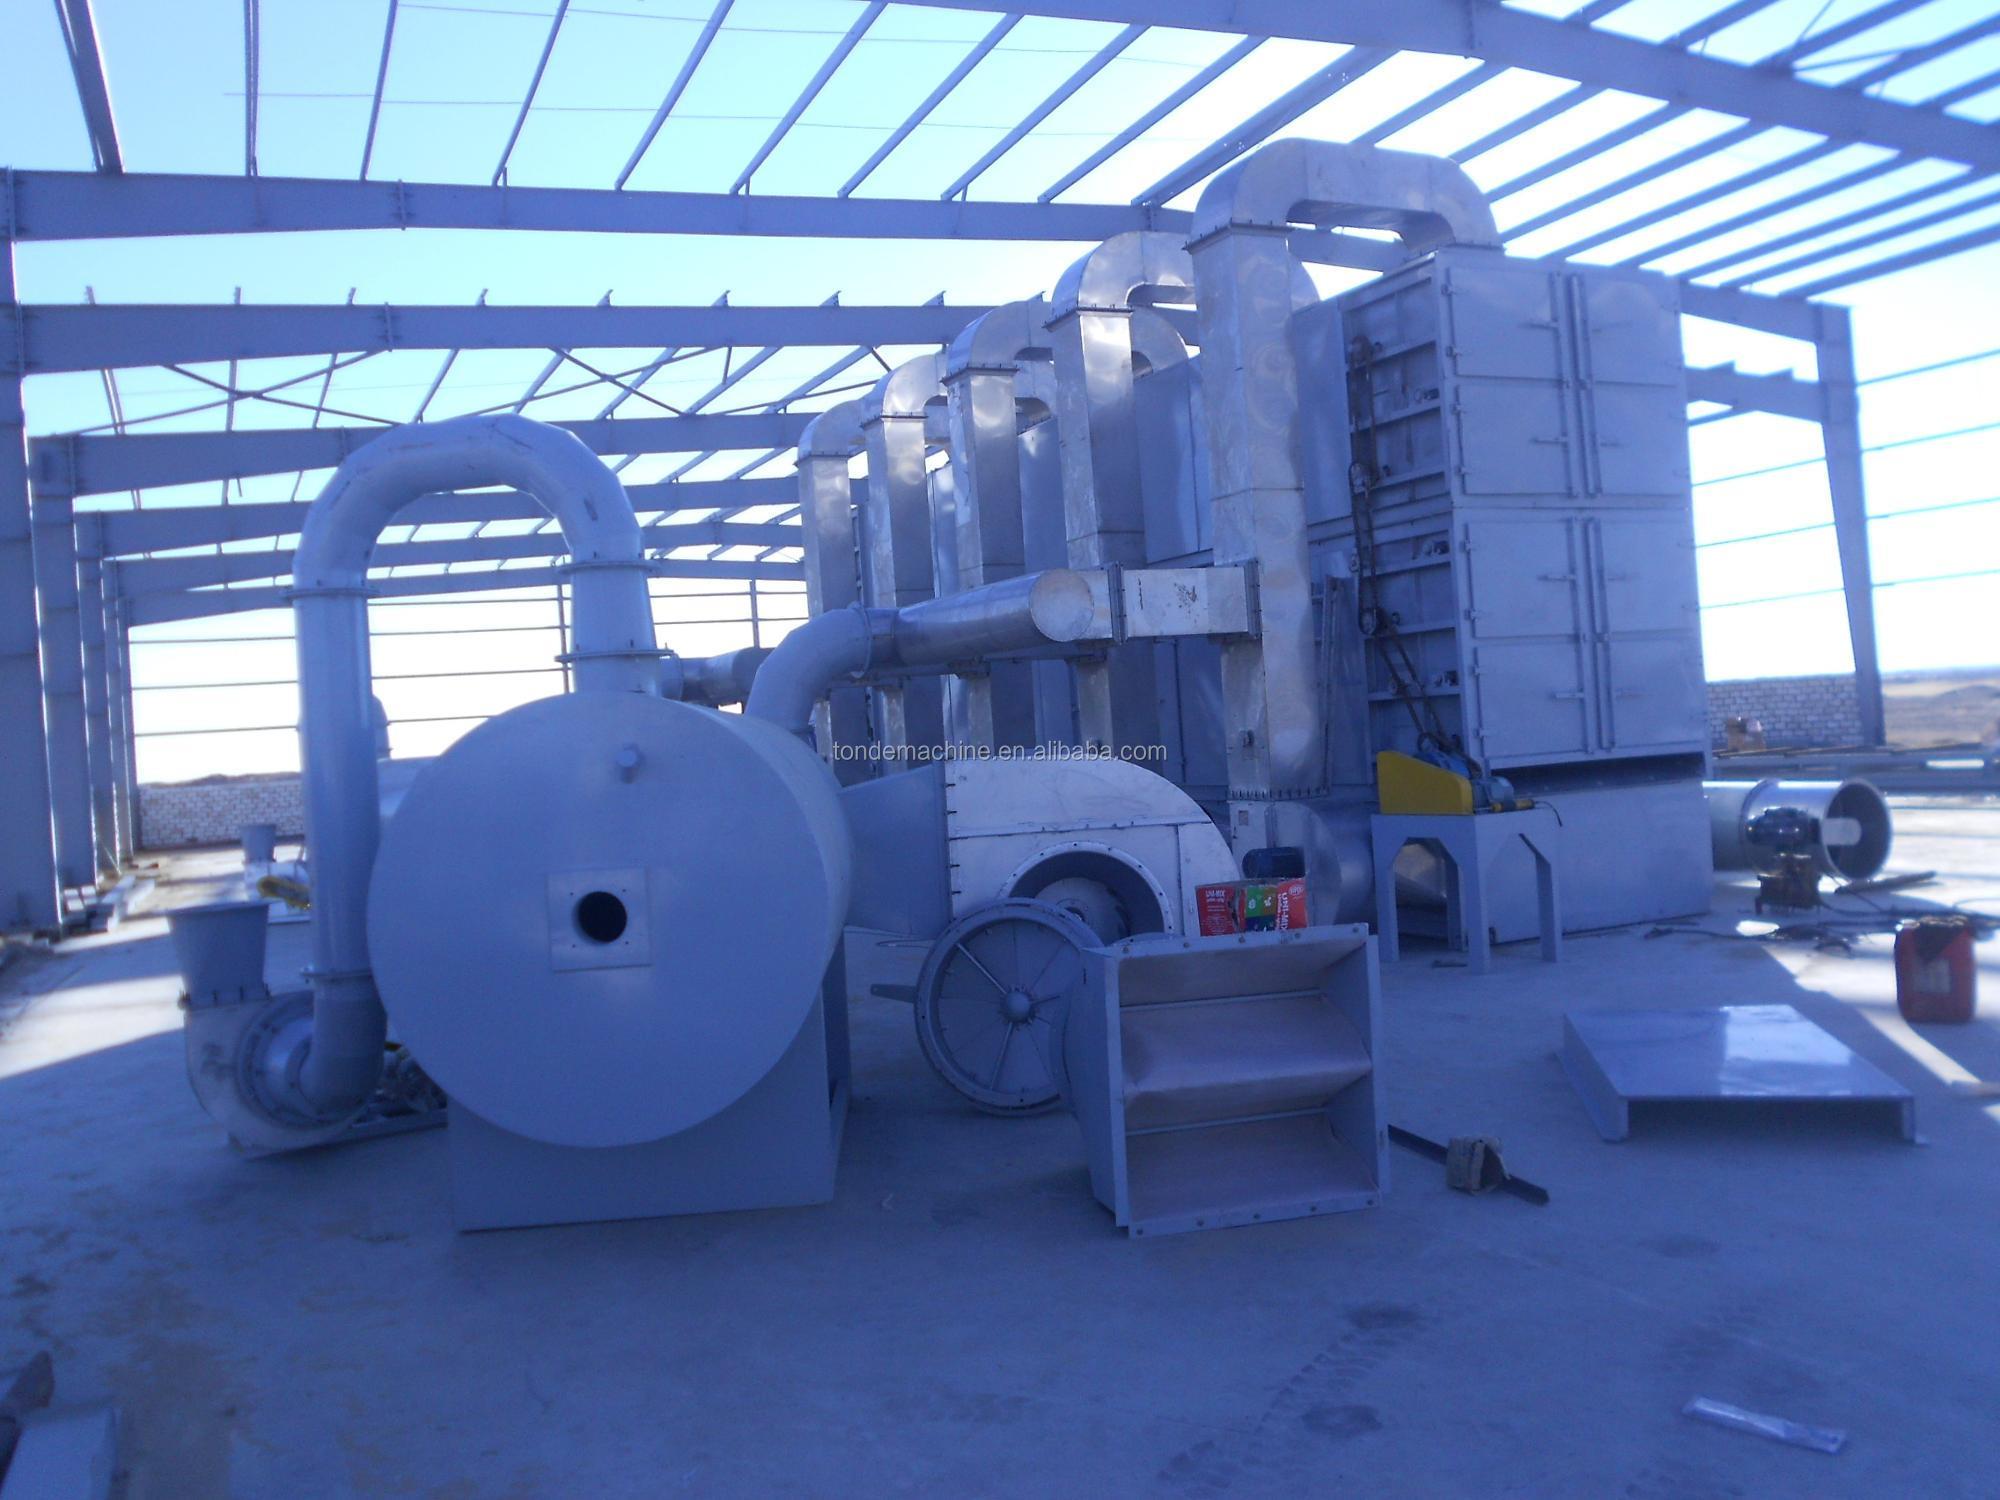 Industriële fruit drogen machine transportband hete lucht droogoven